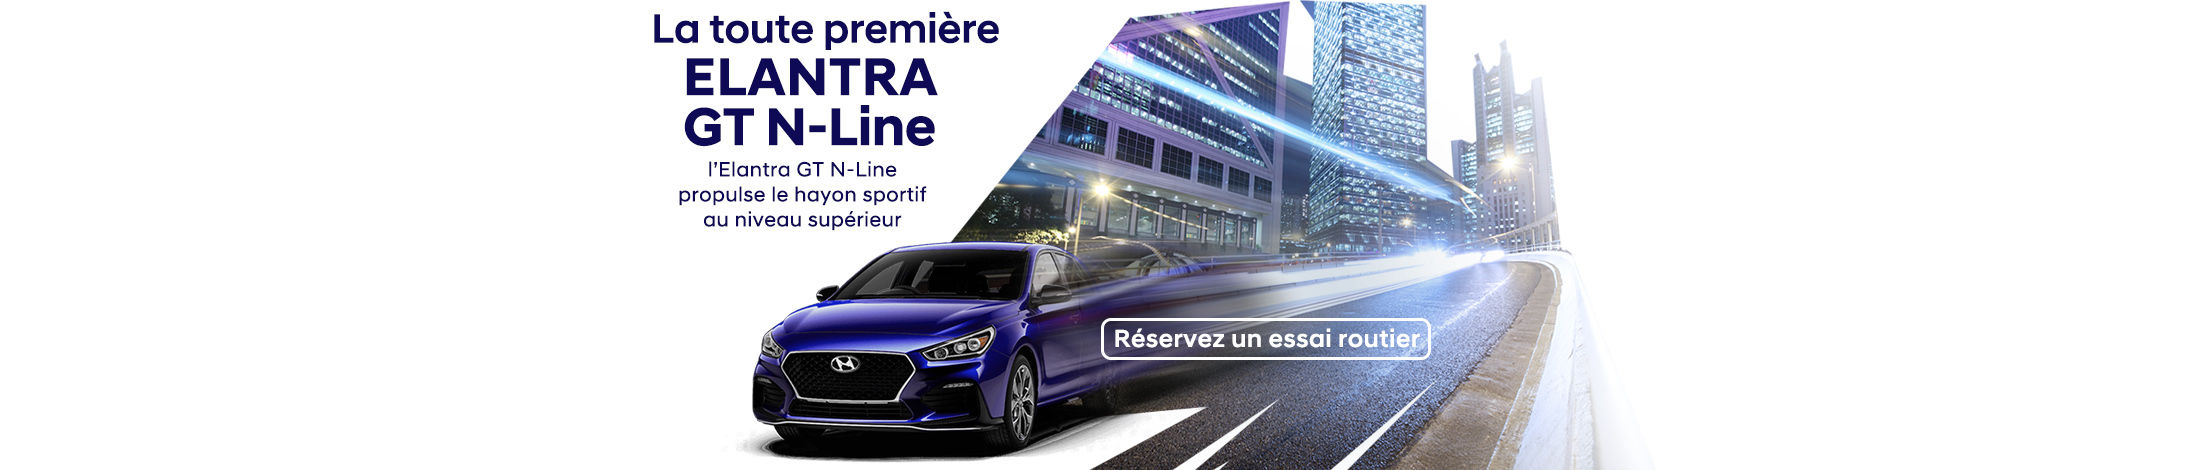 Elantra GT N Line 2019